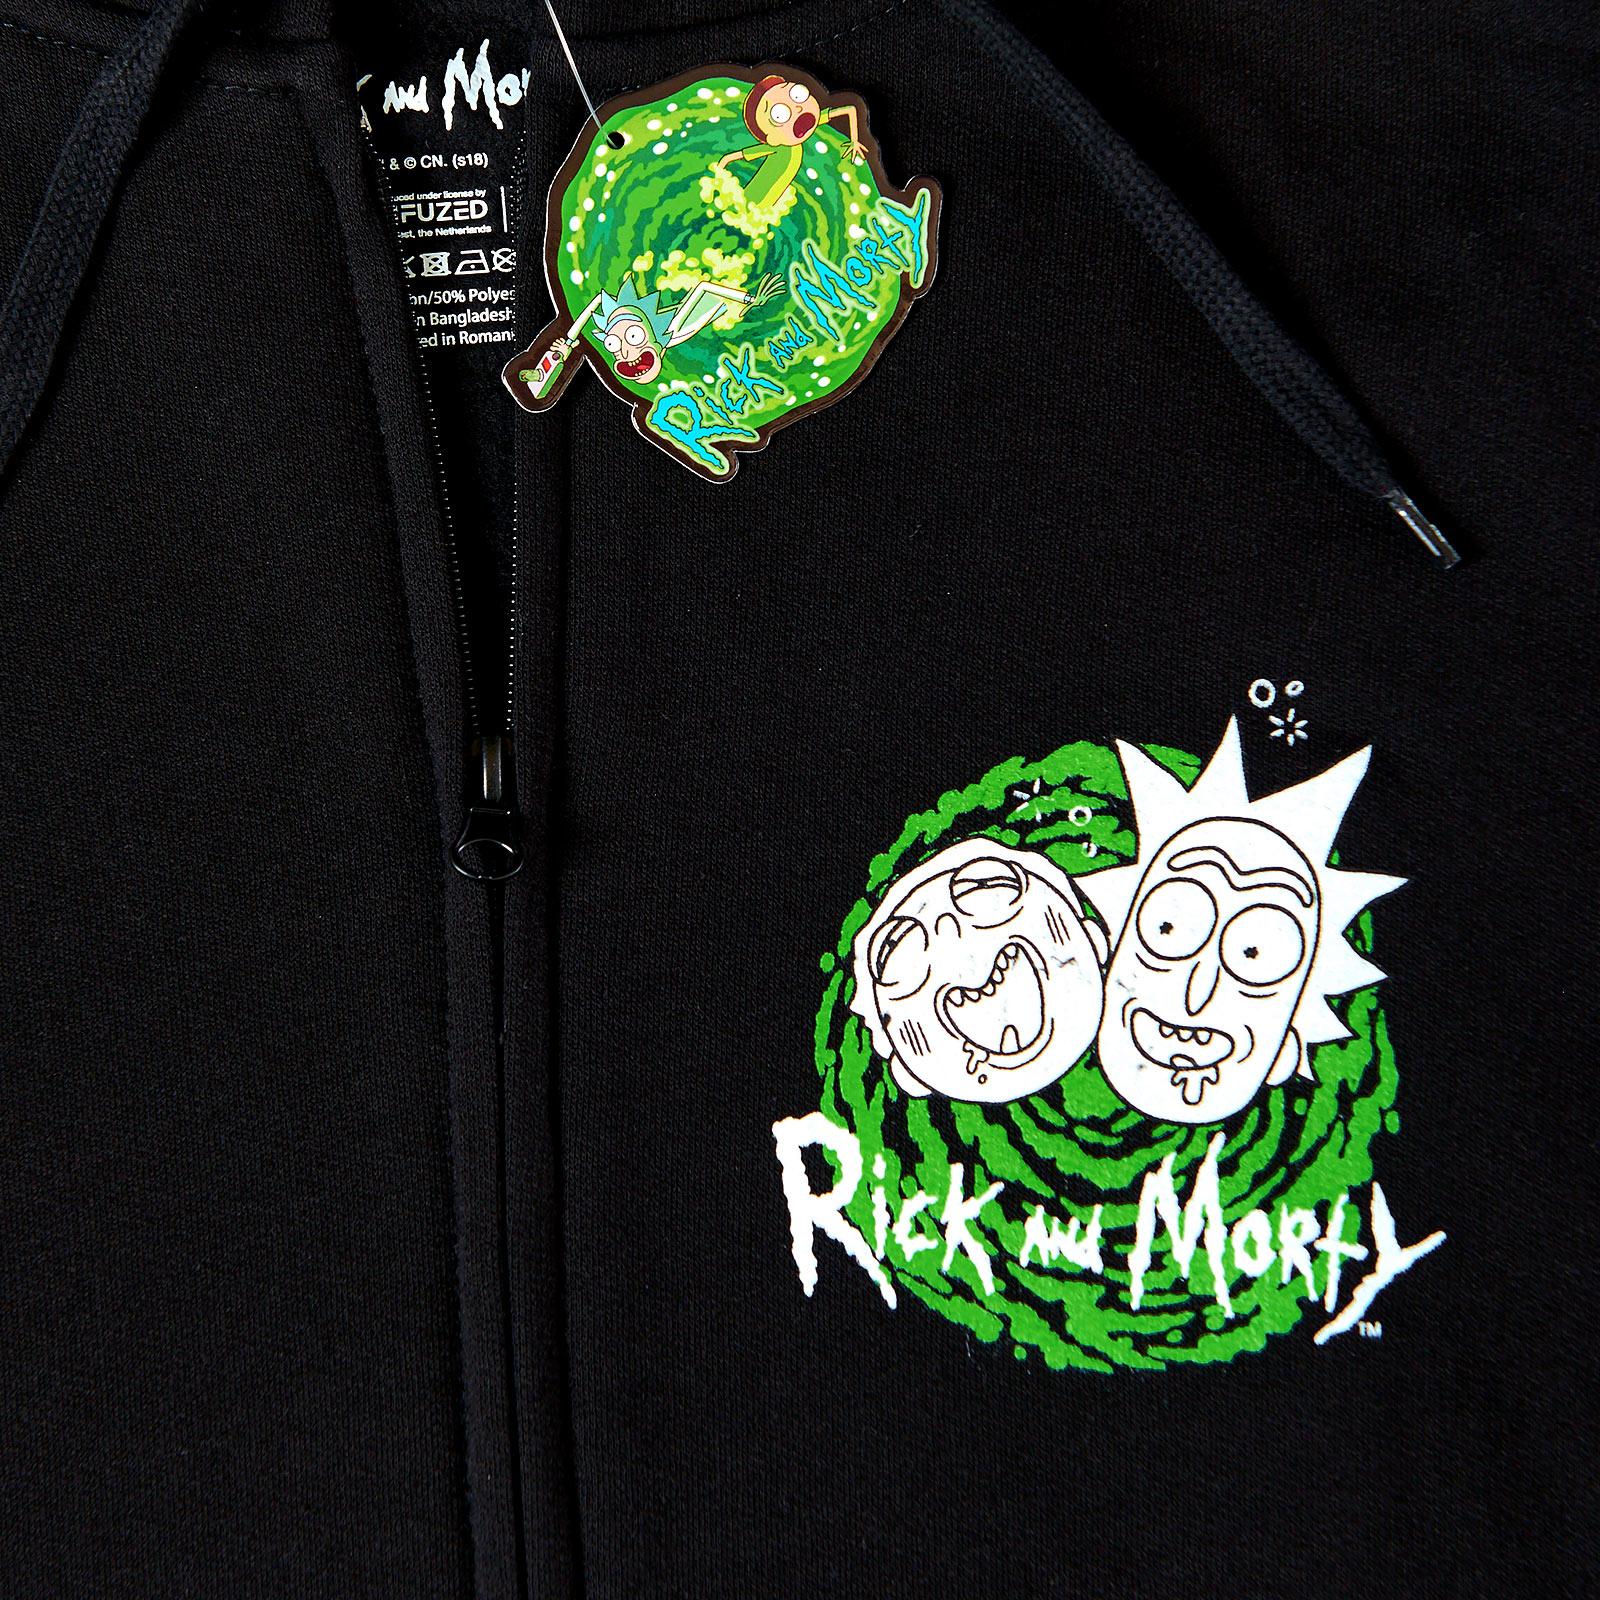 Rick and Morty - Riggity Wrecked Kapuzenjacke schwarz